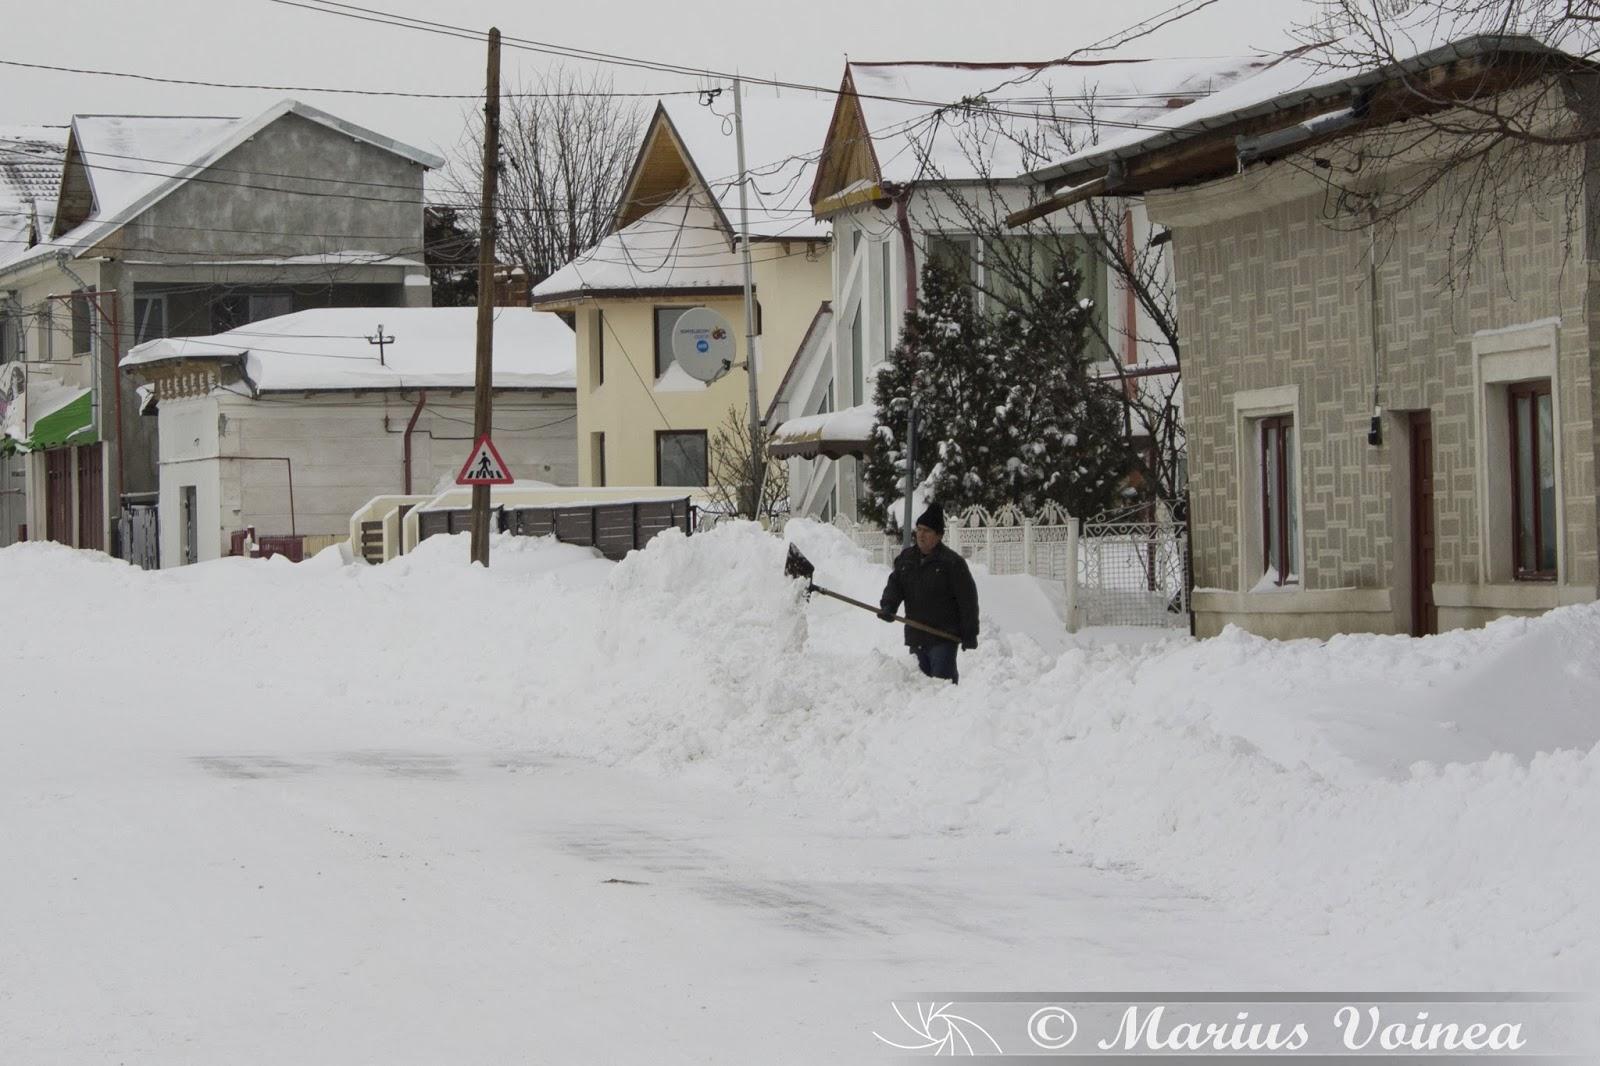 iarna la ramnicu sarat, 2014 foto 14